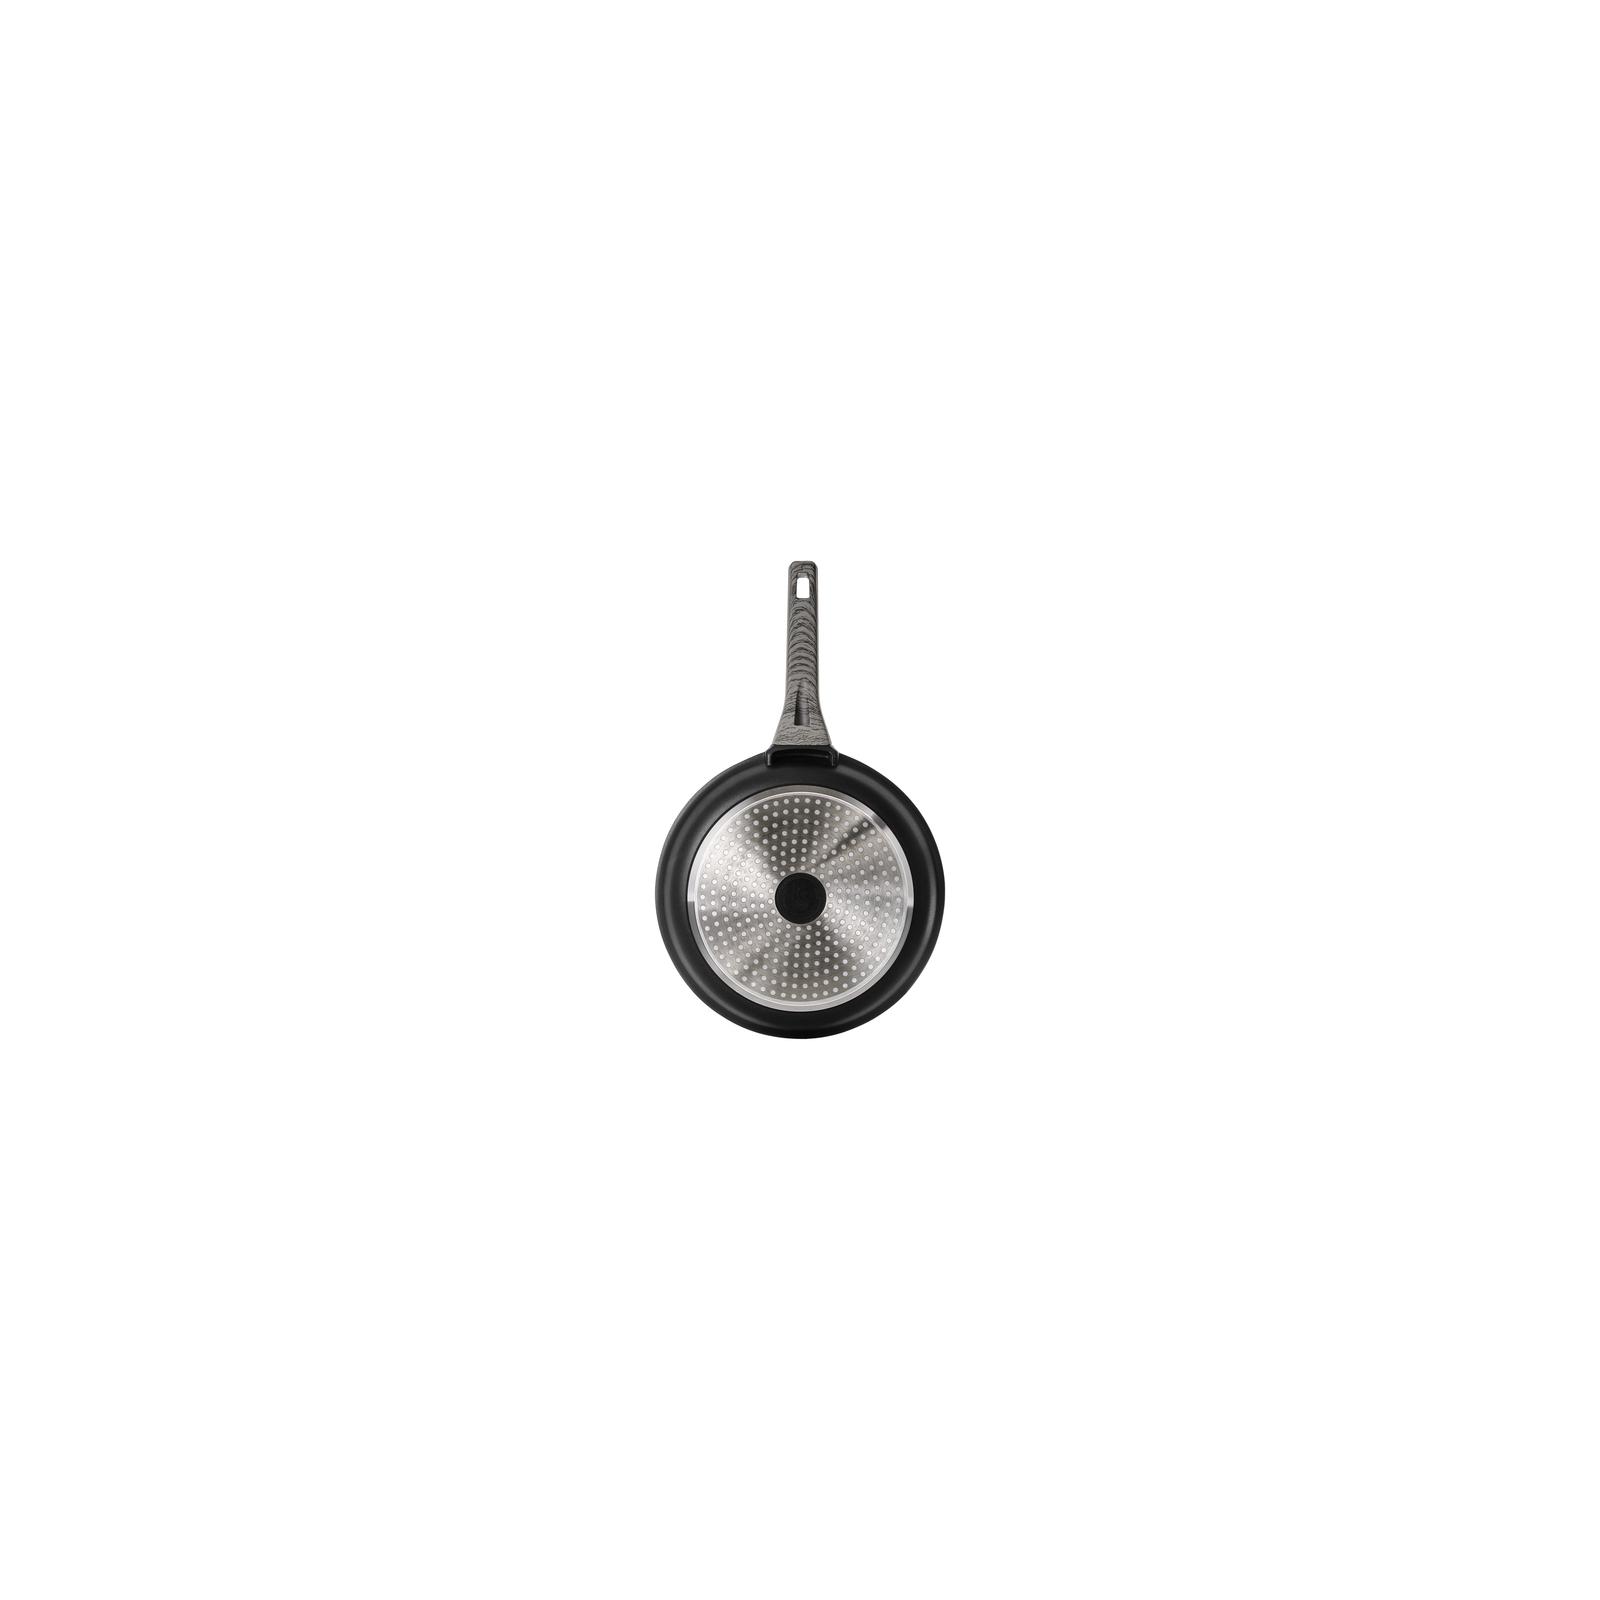 Сковорода Ringel IQ Smart 24 см (RG-1124-24) изображение 6